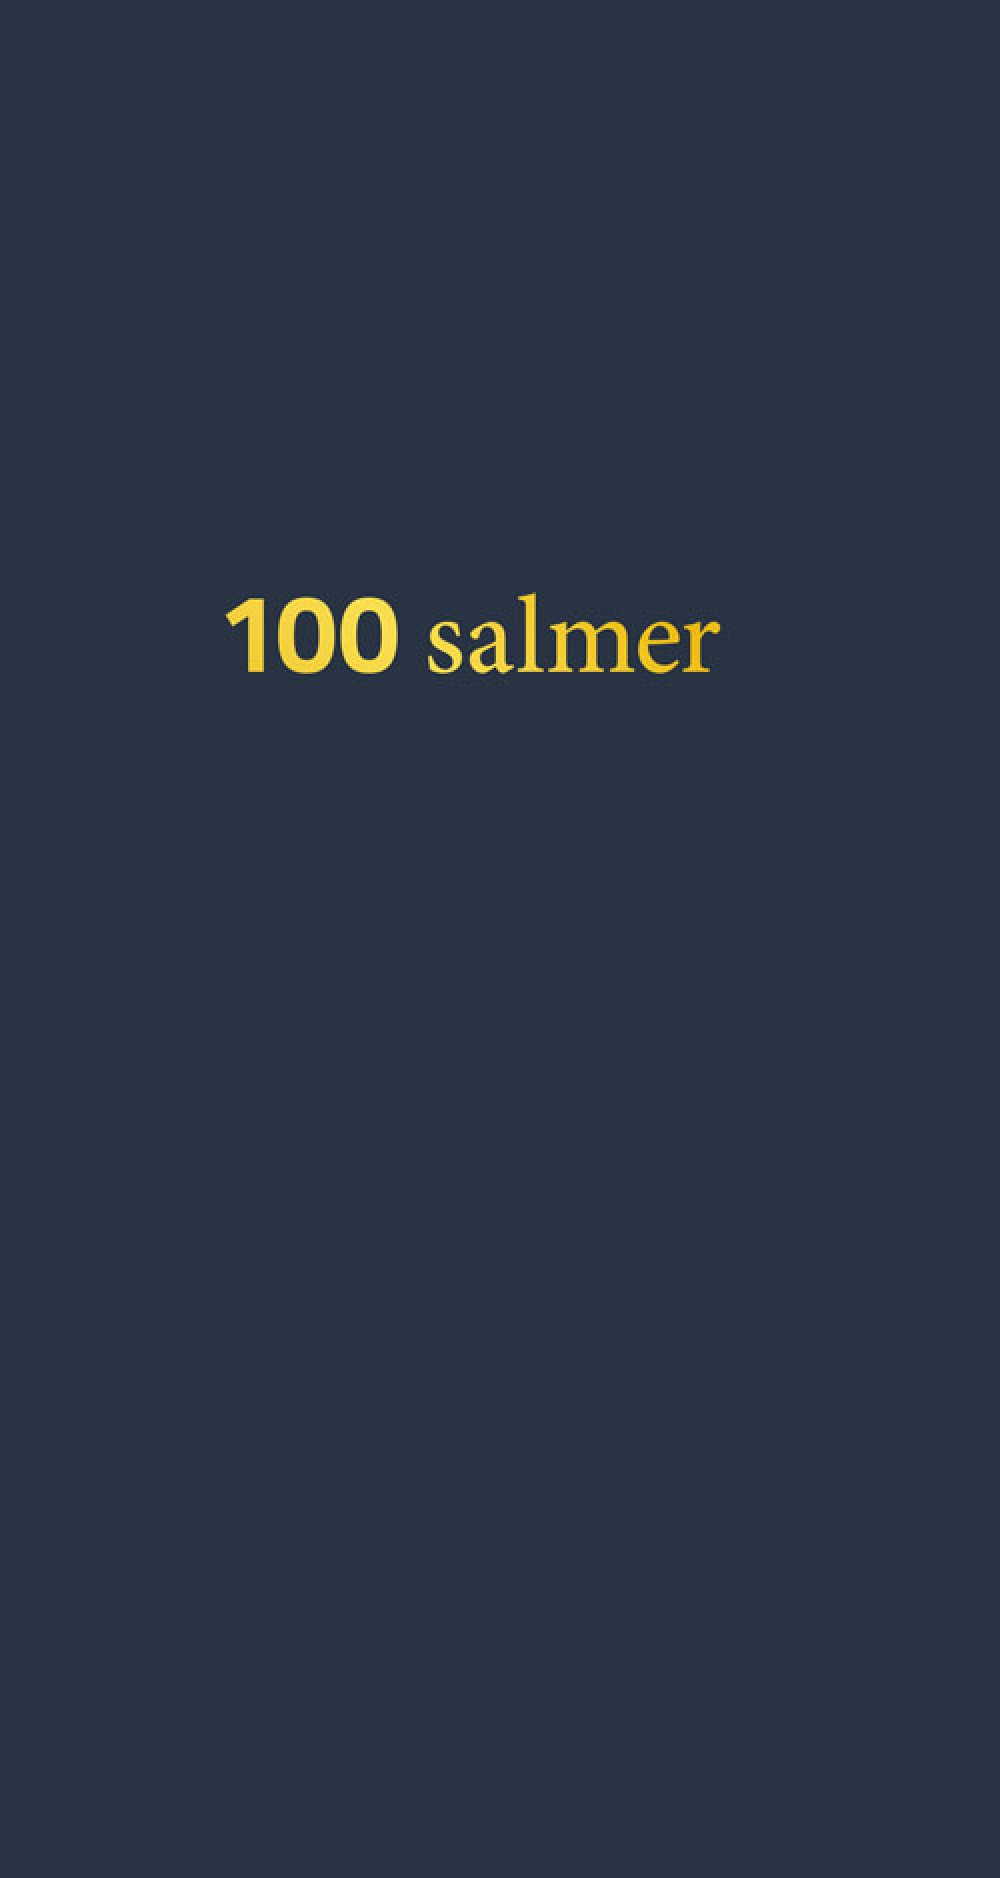 gode salmer